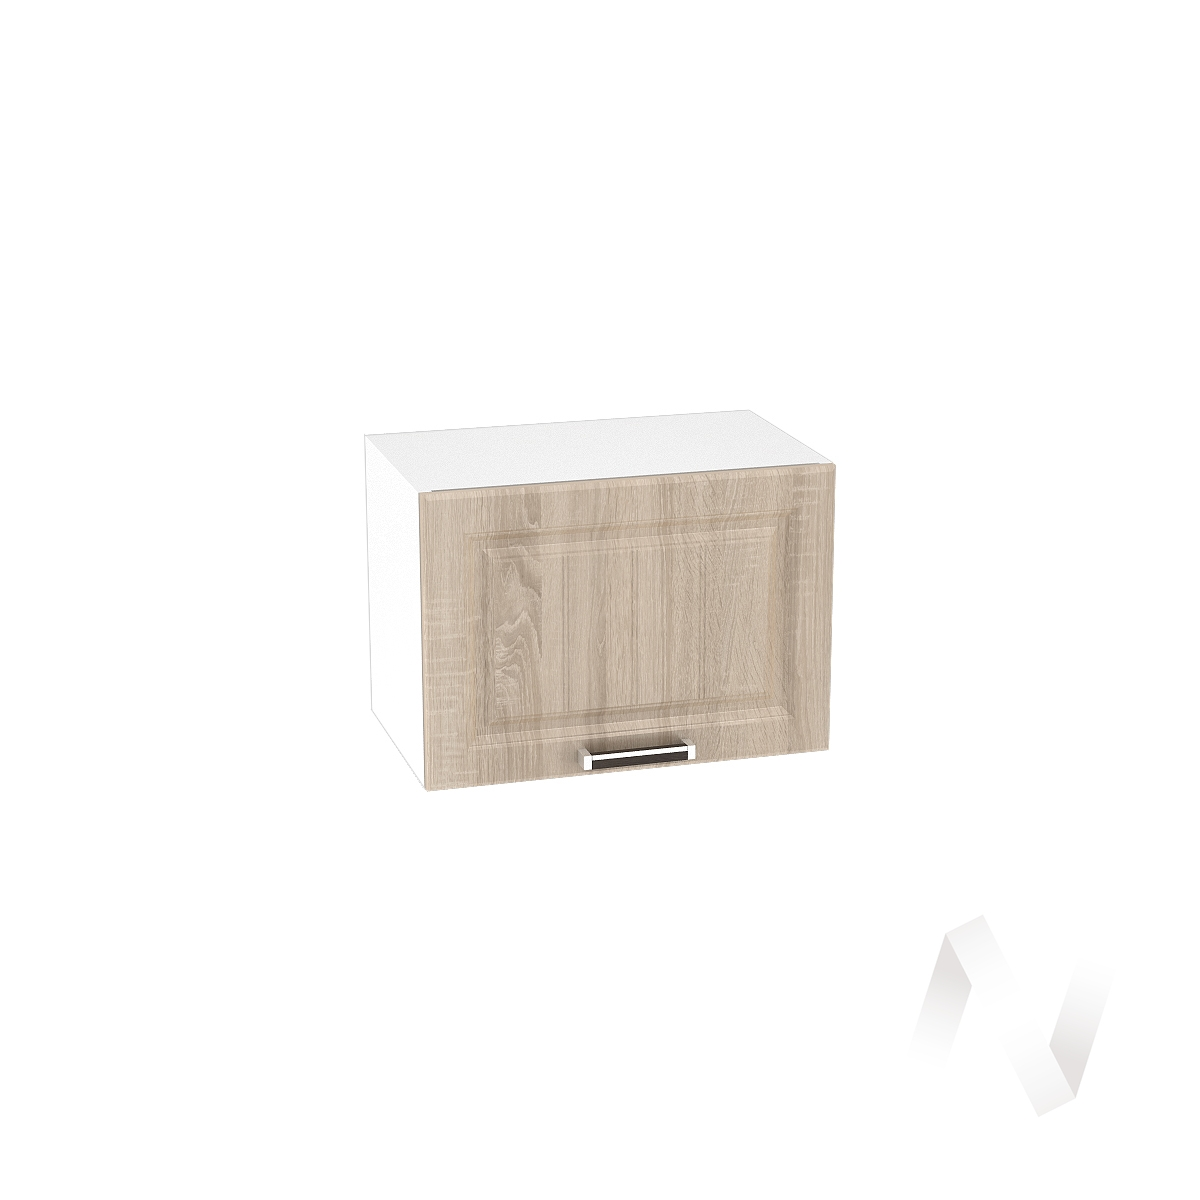 "Кухня ""Прага"": Шкаф верхний горизонтальный 500, ШВГ 500 (дуб сонома/корпус белый)"